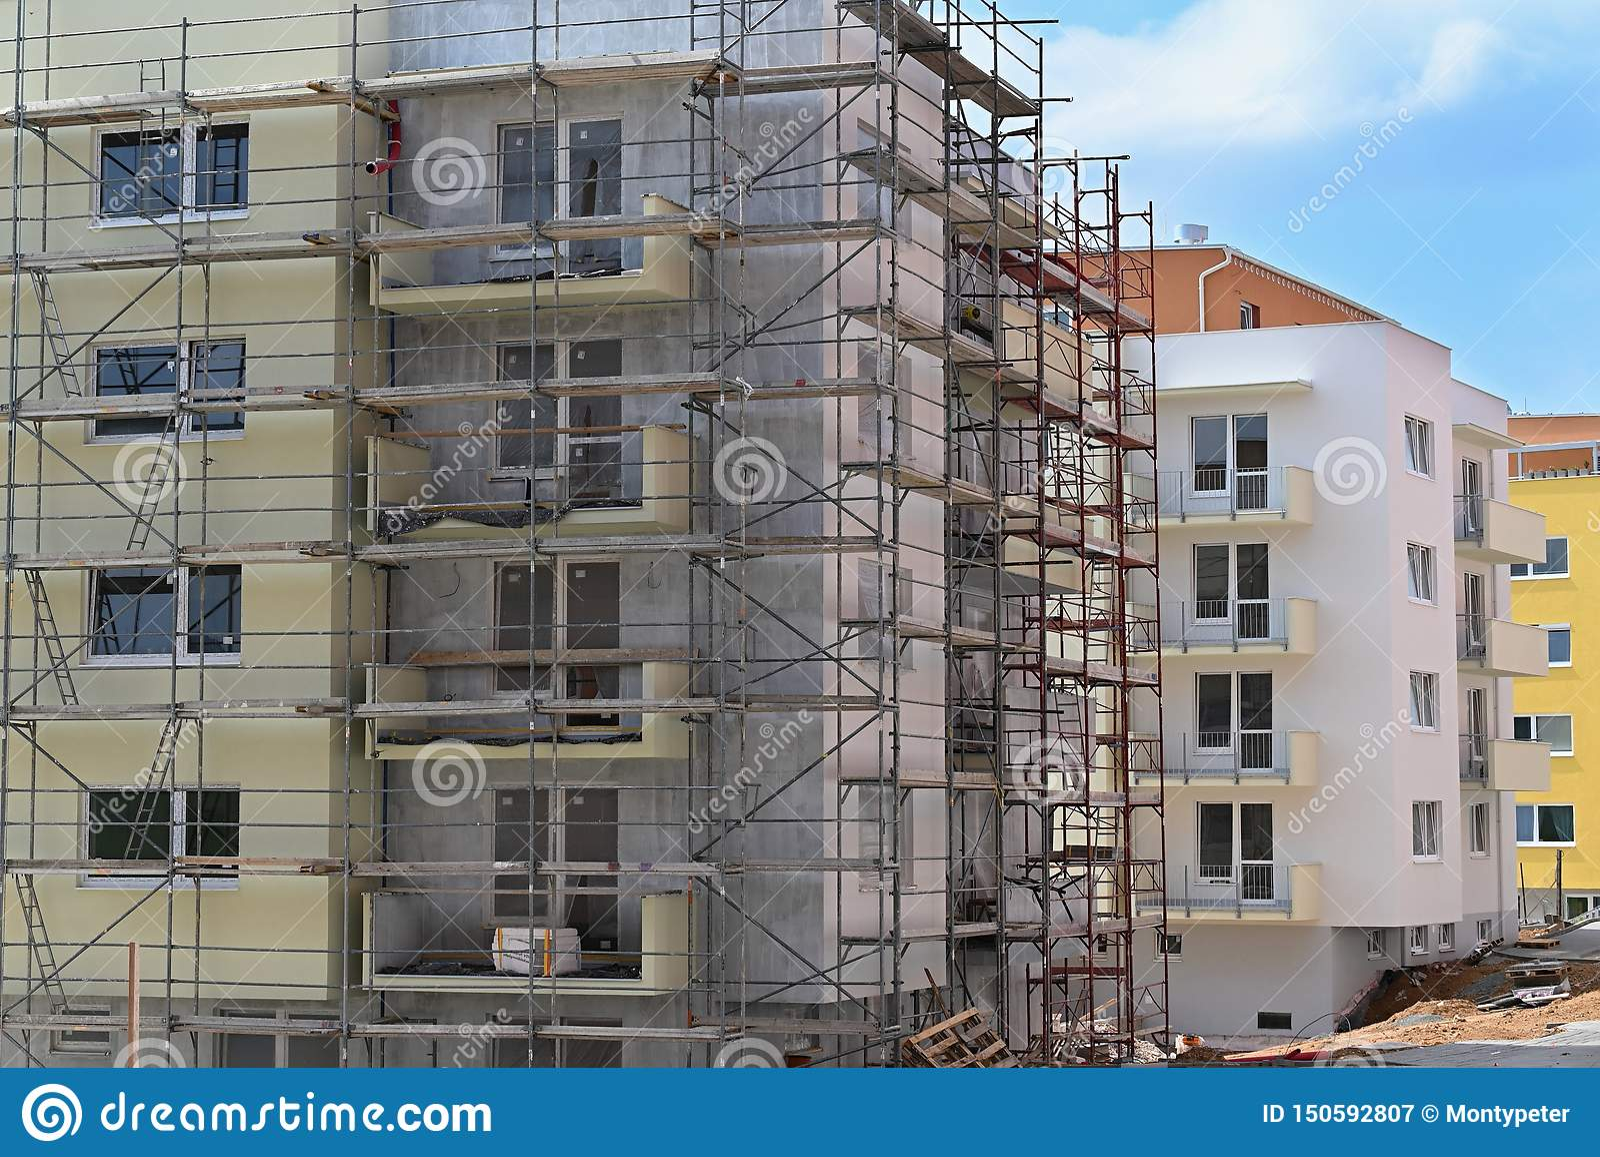 Constru??o de edif?cios novos Fundo bonito para a ind?stria da constru??o civil